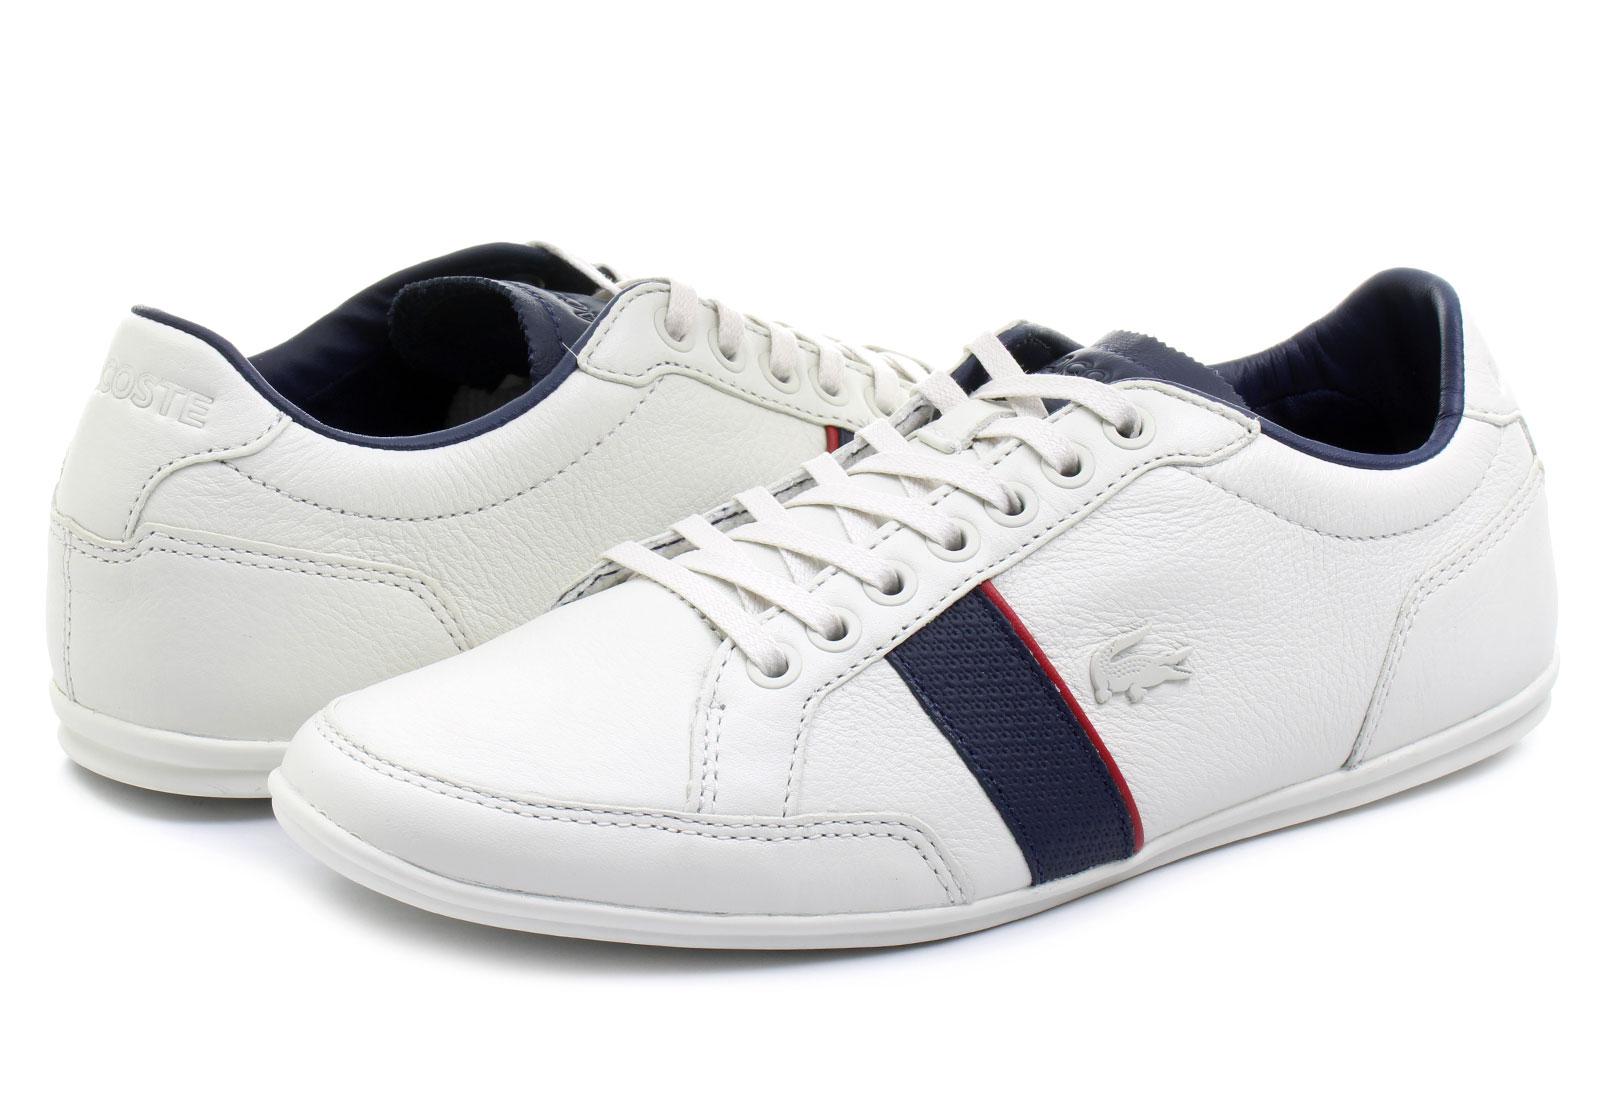 Lacoste Shoe Online Shopping